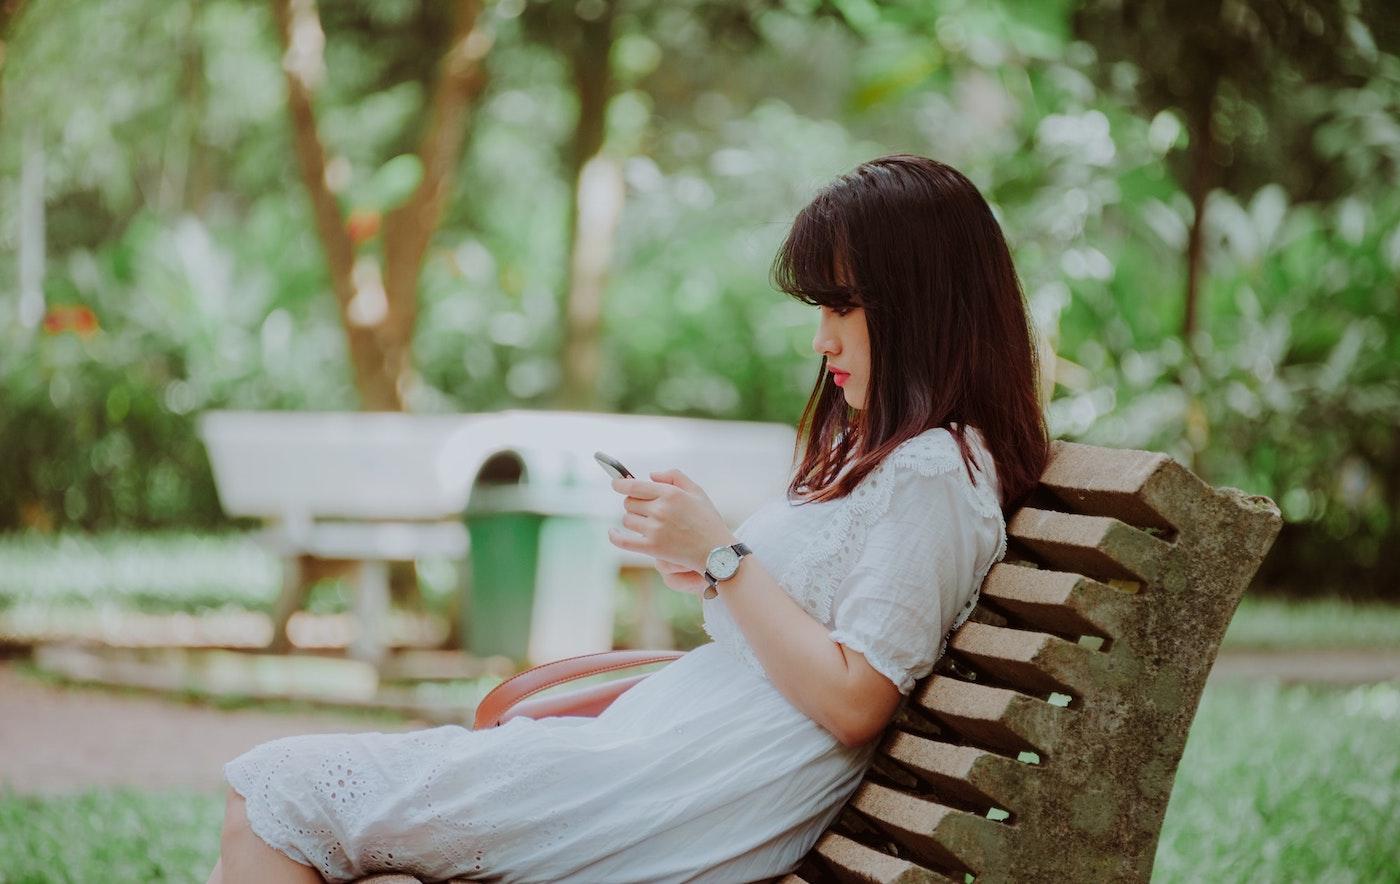 woman-sitting-on-bench-scrolling-social-media